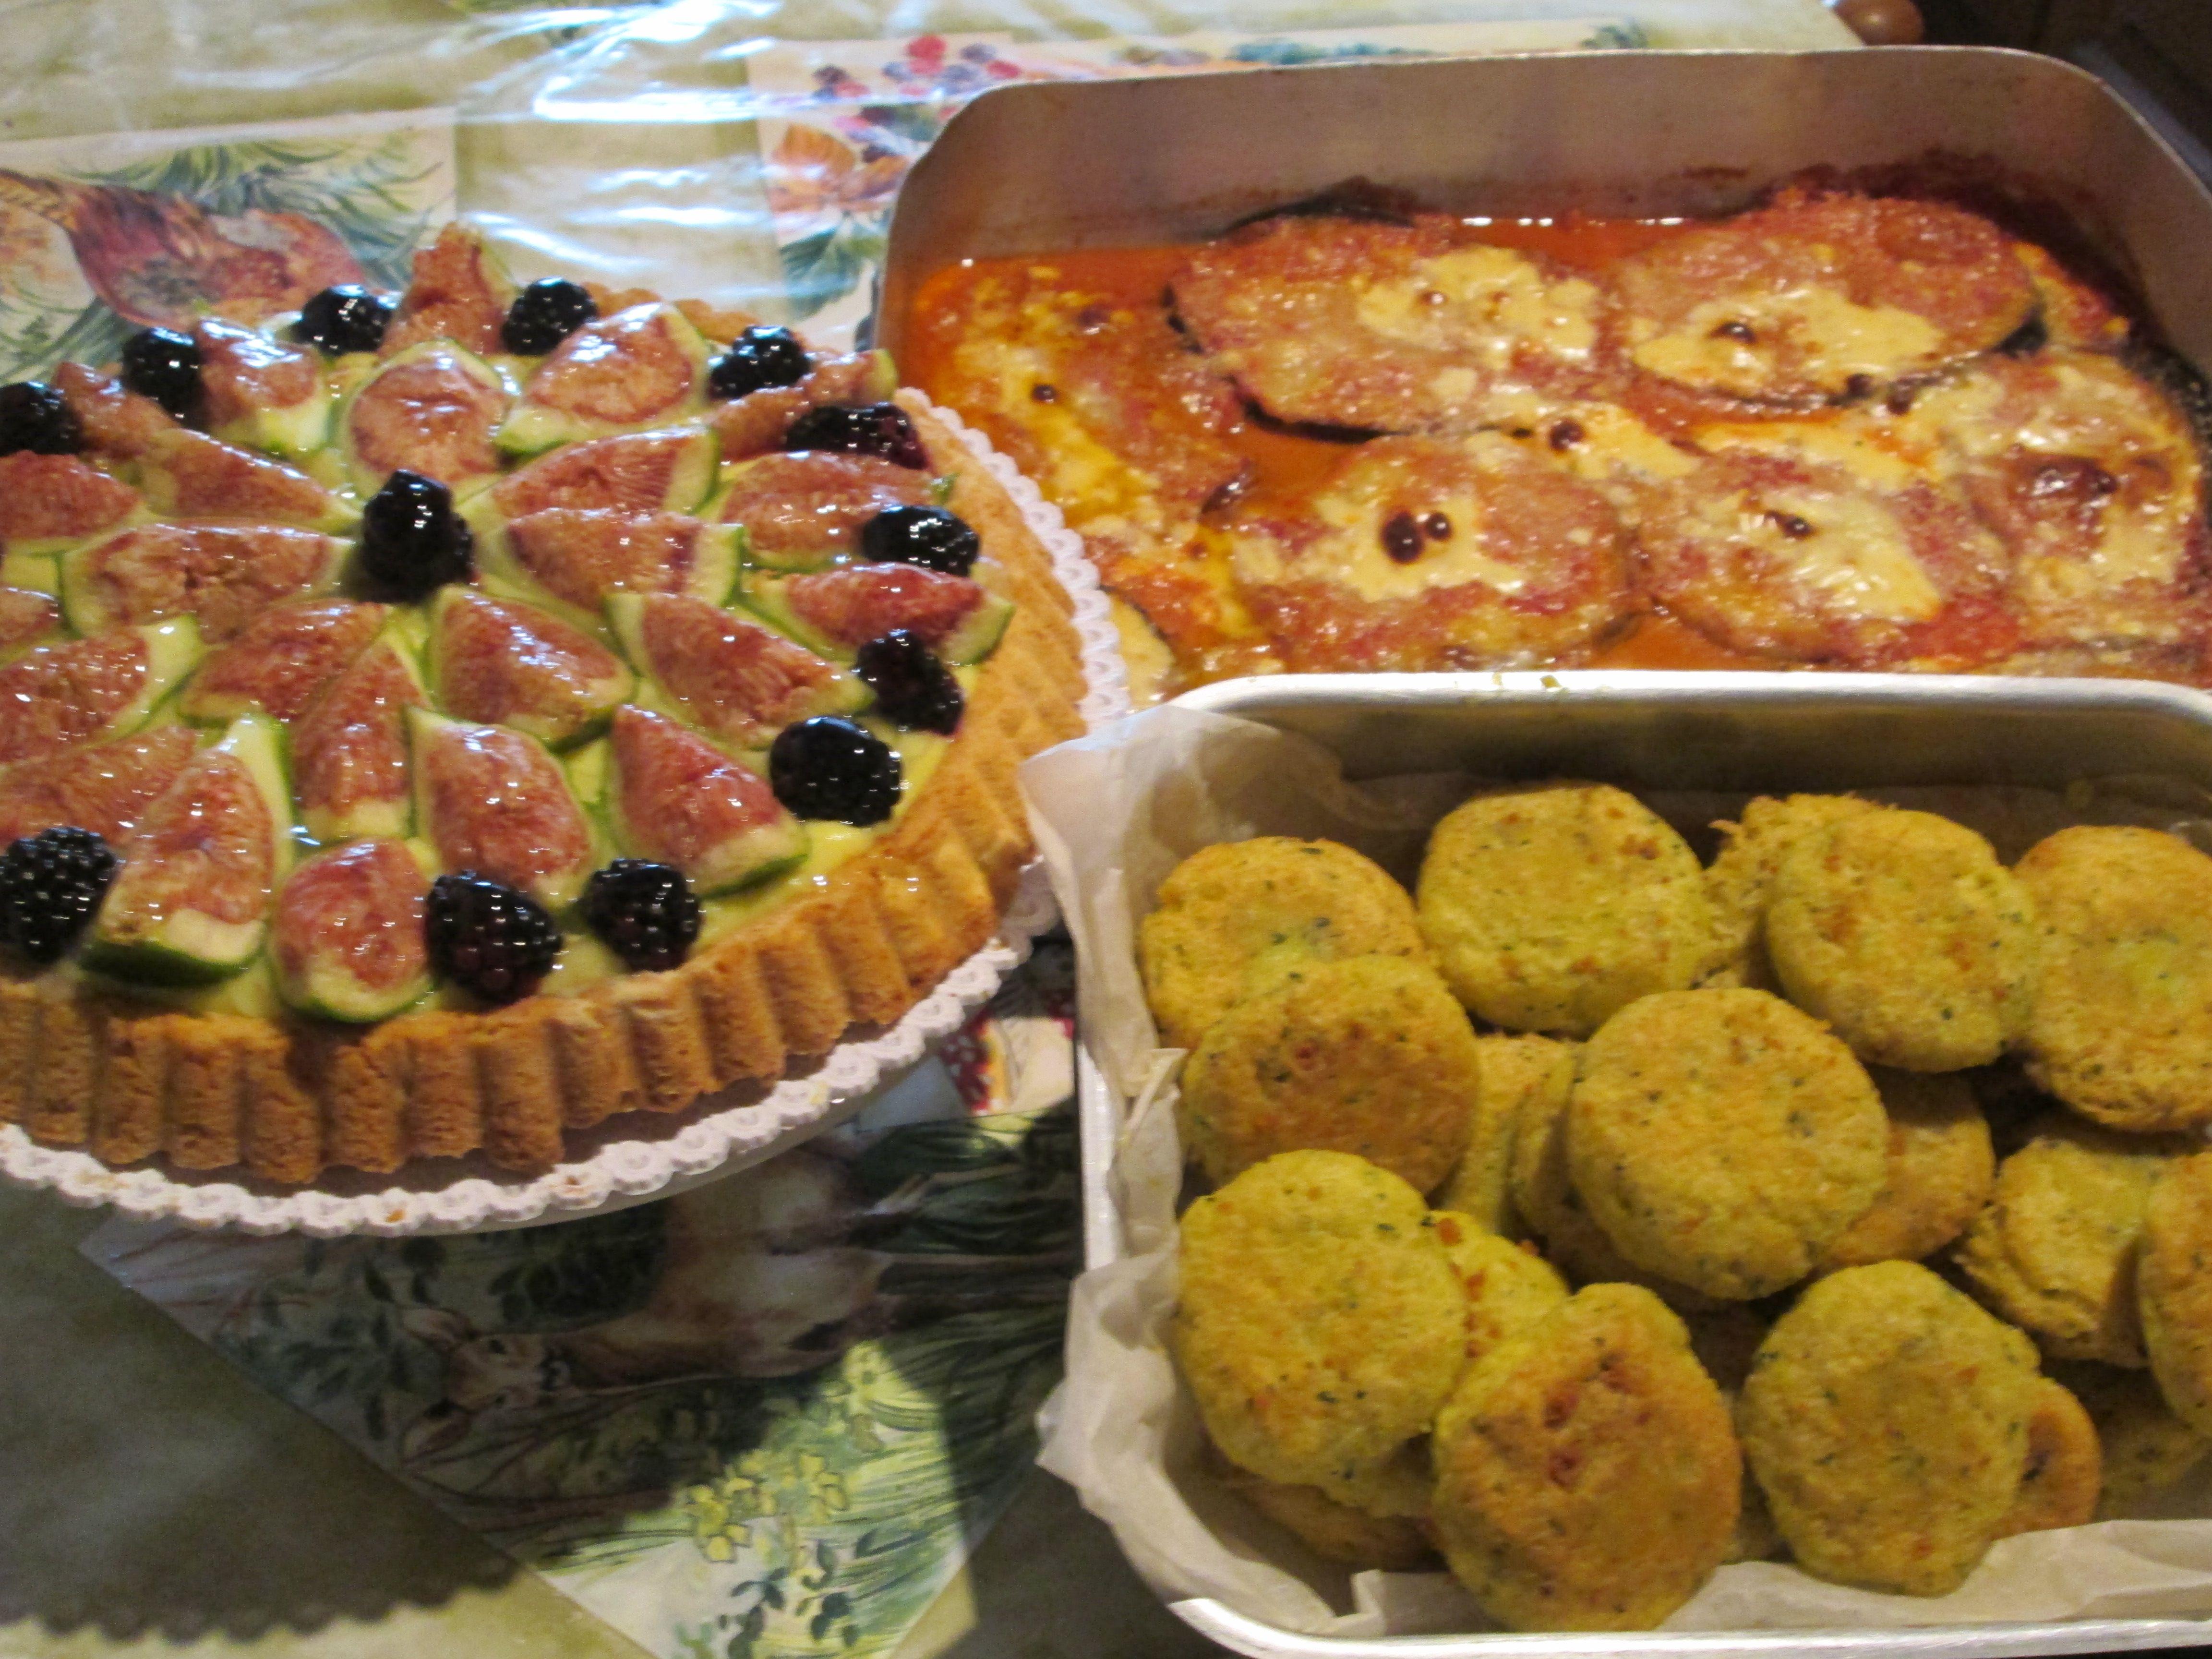 menu vegetariano    3 foto http://raccontareunpaese.blogspot.it/2016/07/dalla-mia-cucina-toscana-foto.html